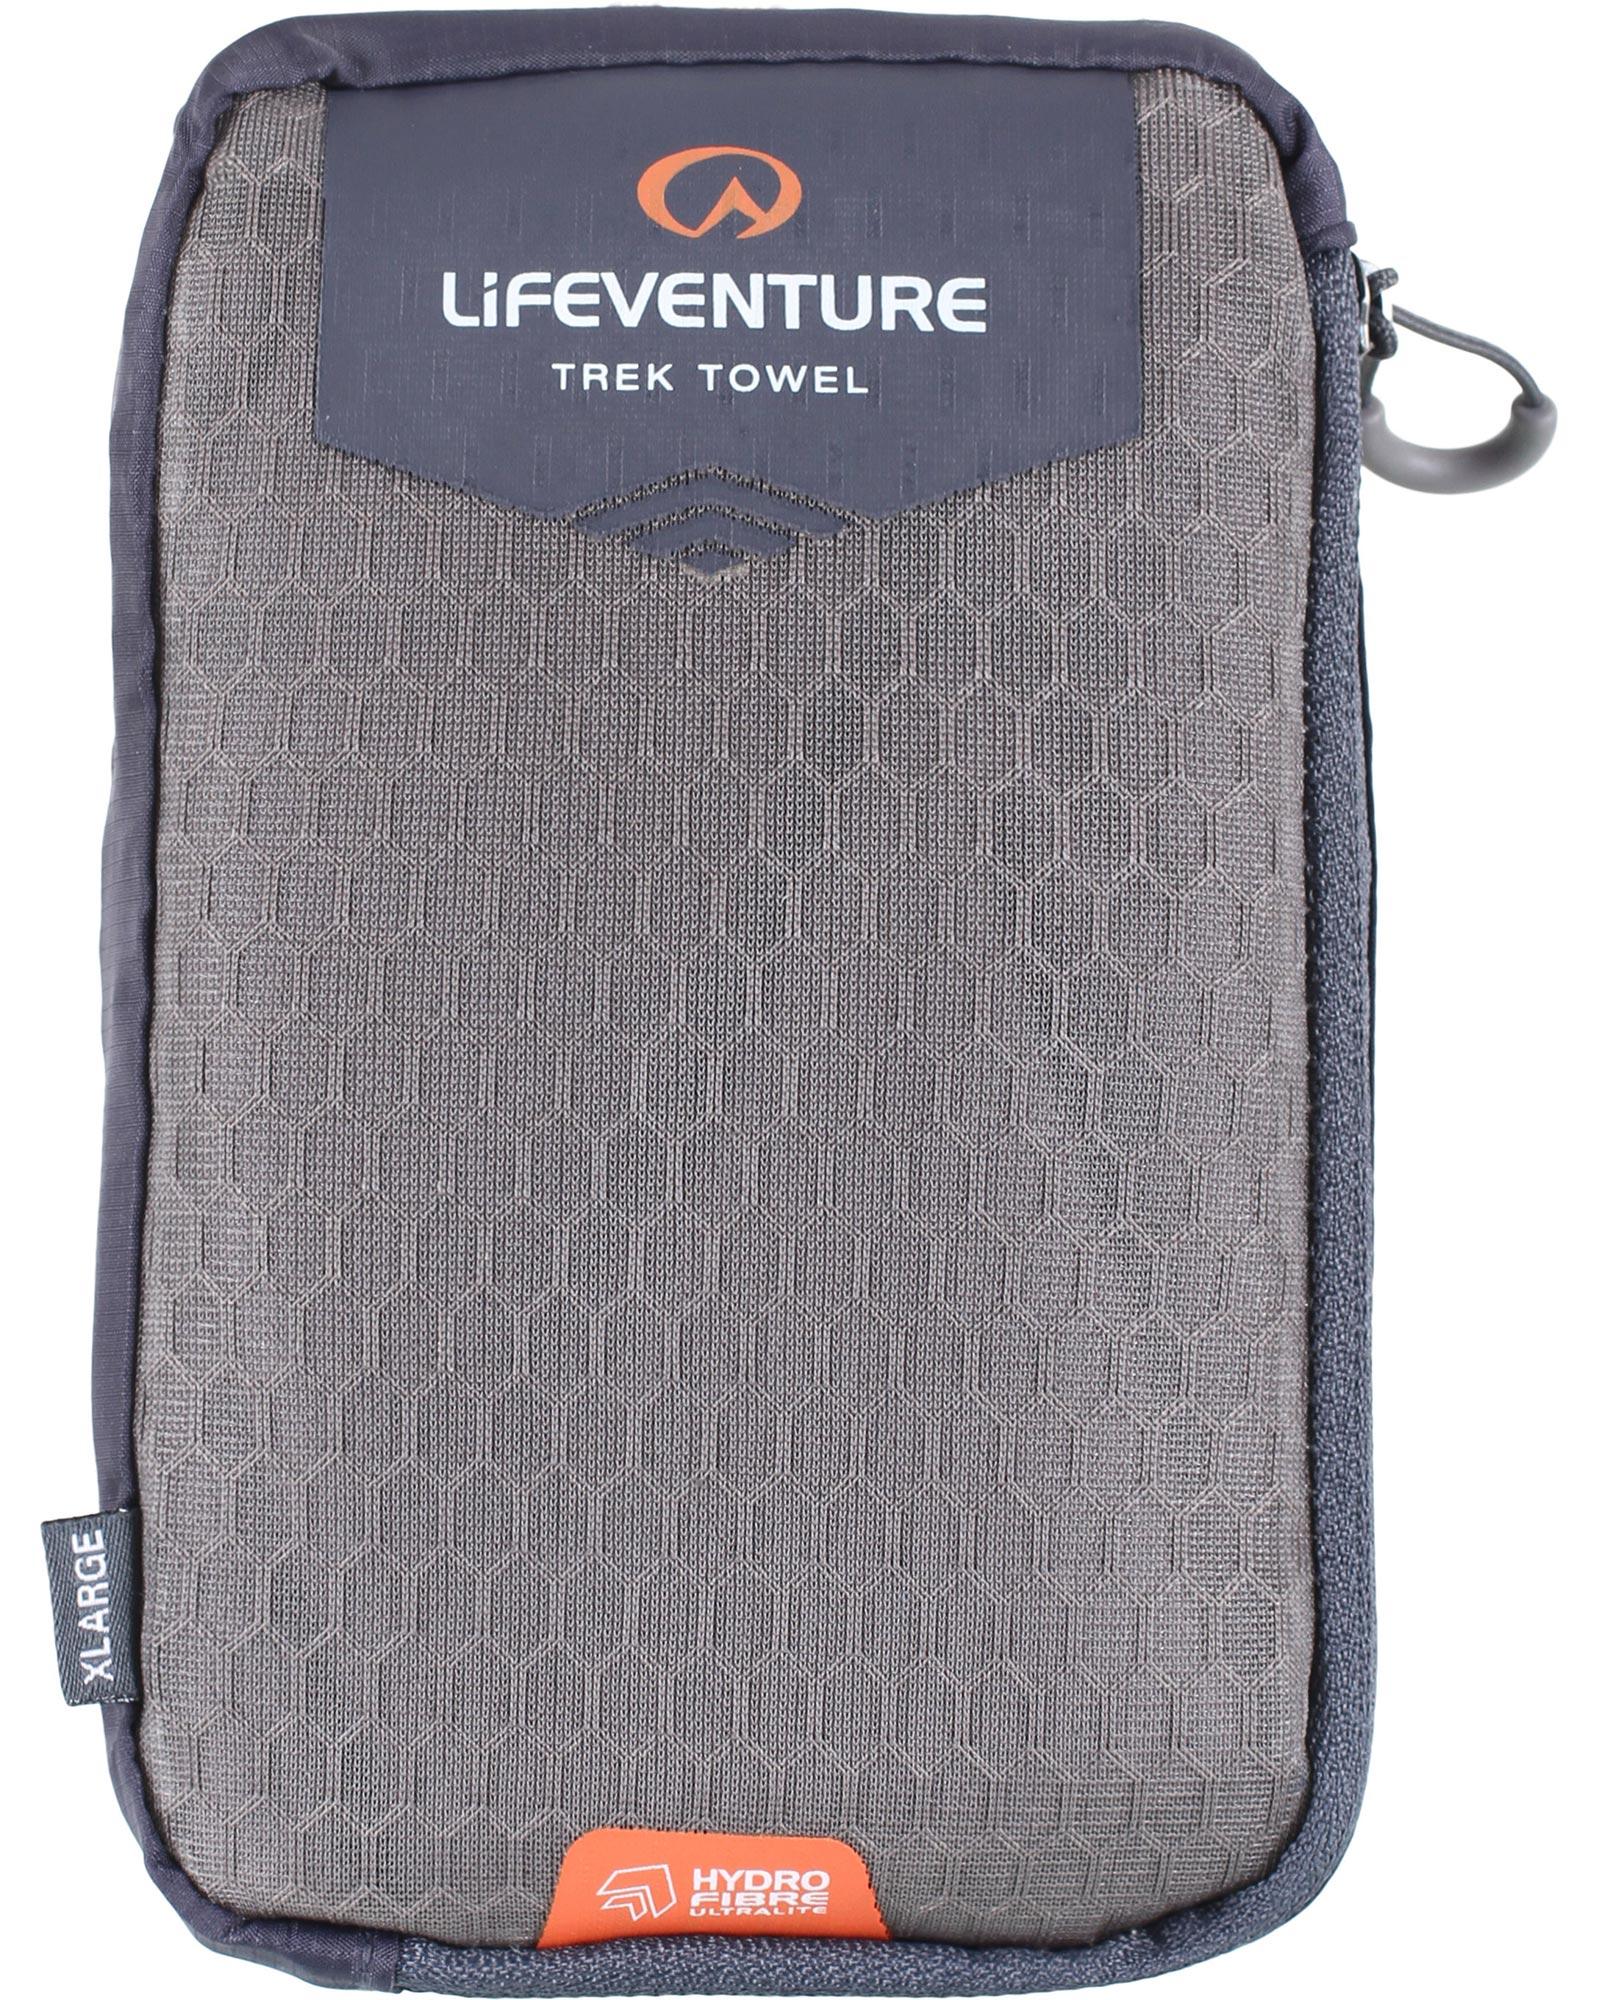 Product image of Lifeventure HydroFibre Trek Towel - X Large